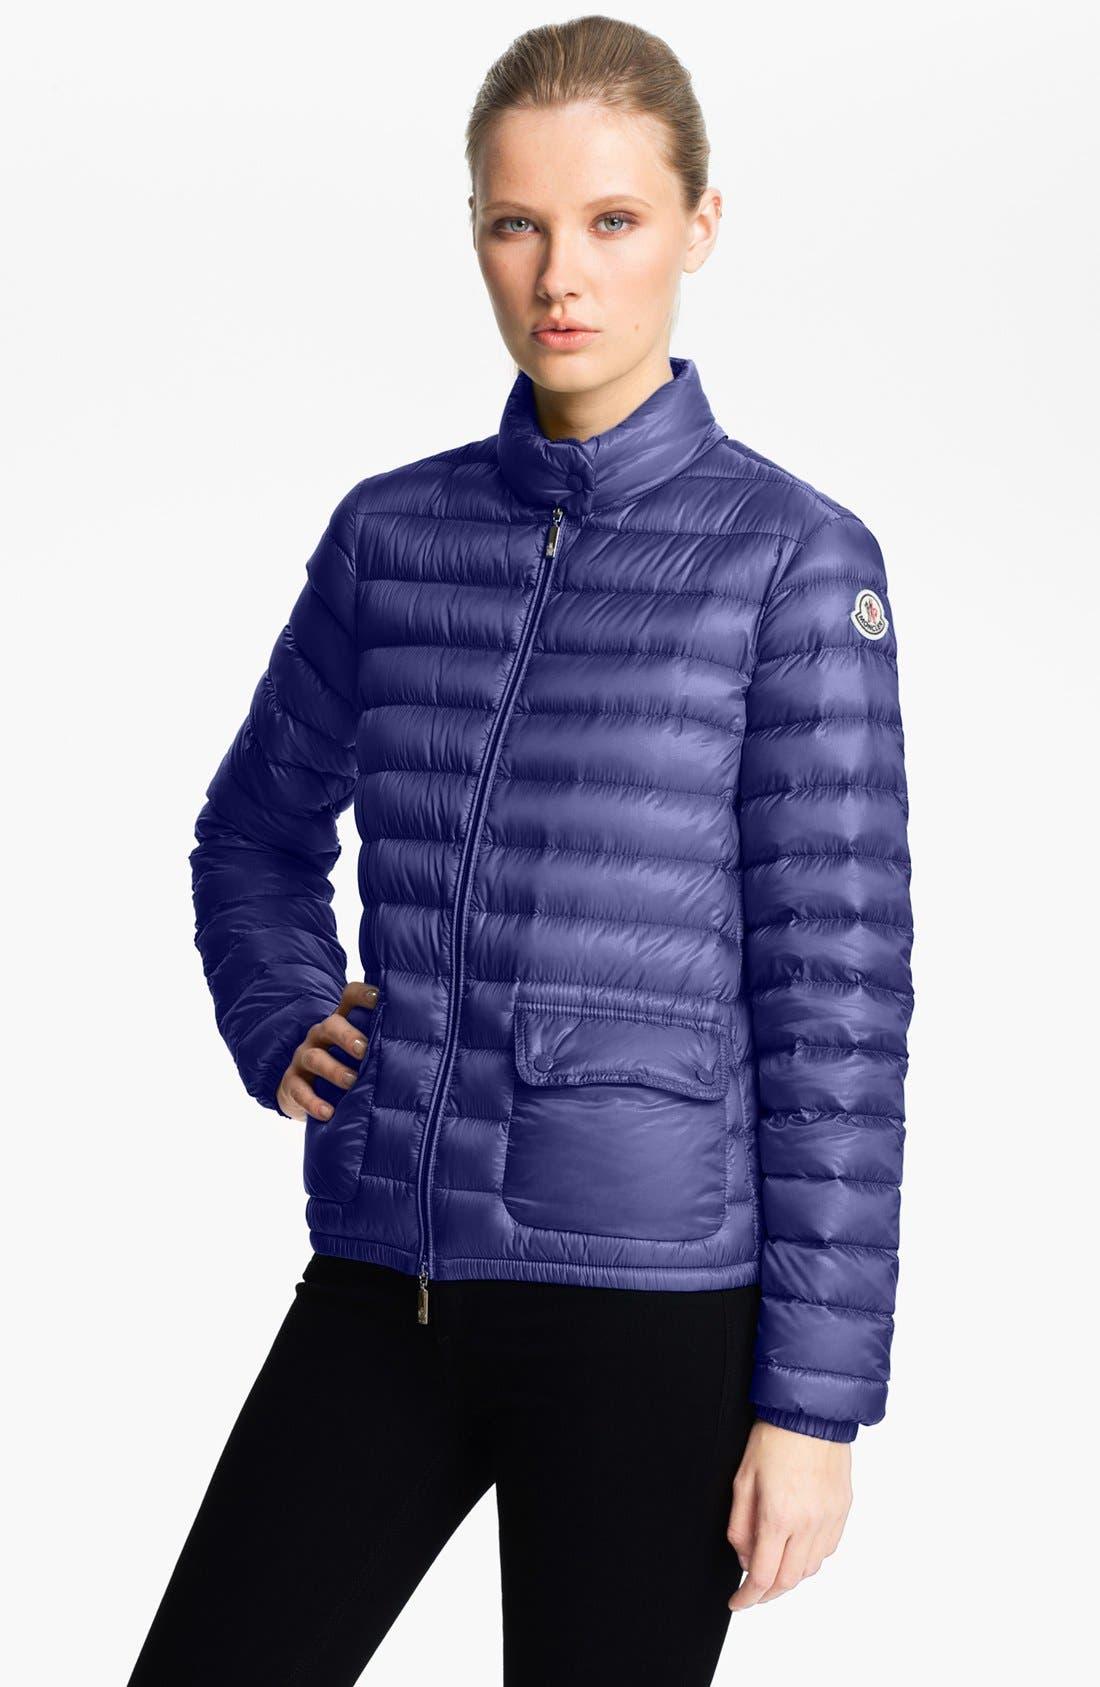 Alternate Image 1 Selected - Moncler 'Lans' Lightweight Down Jacket